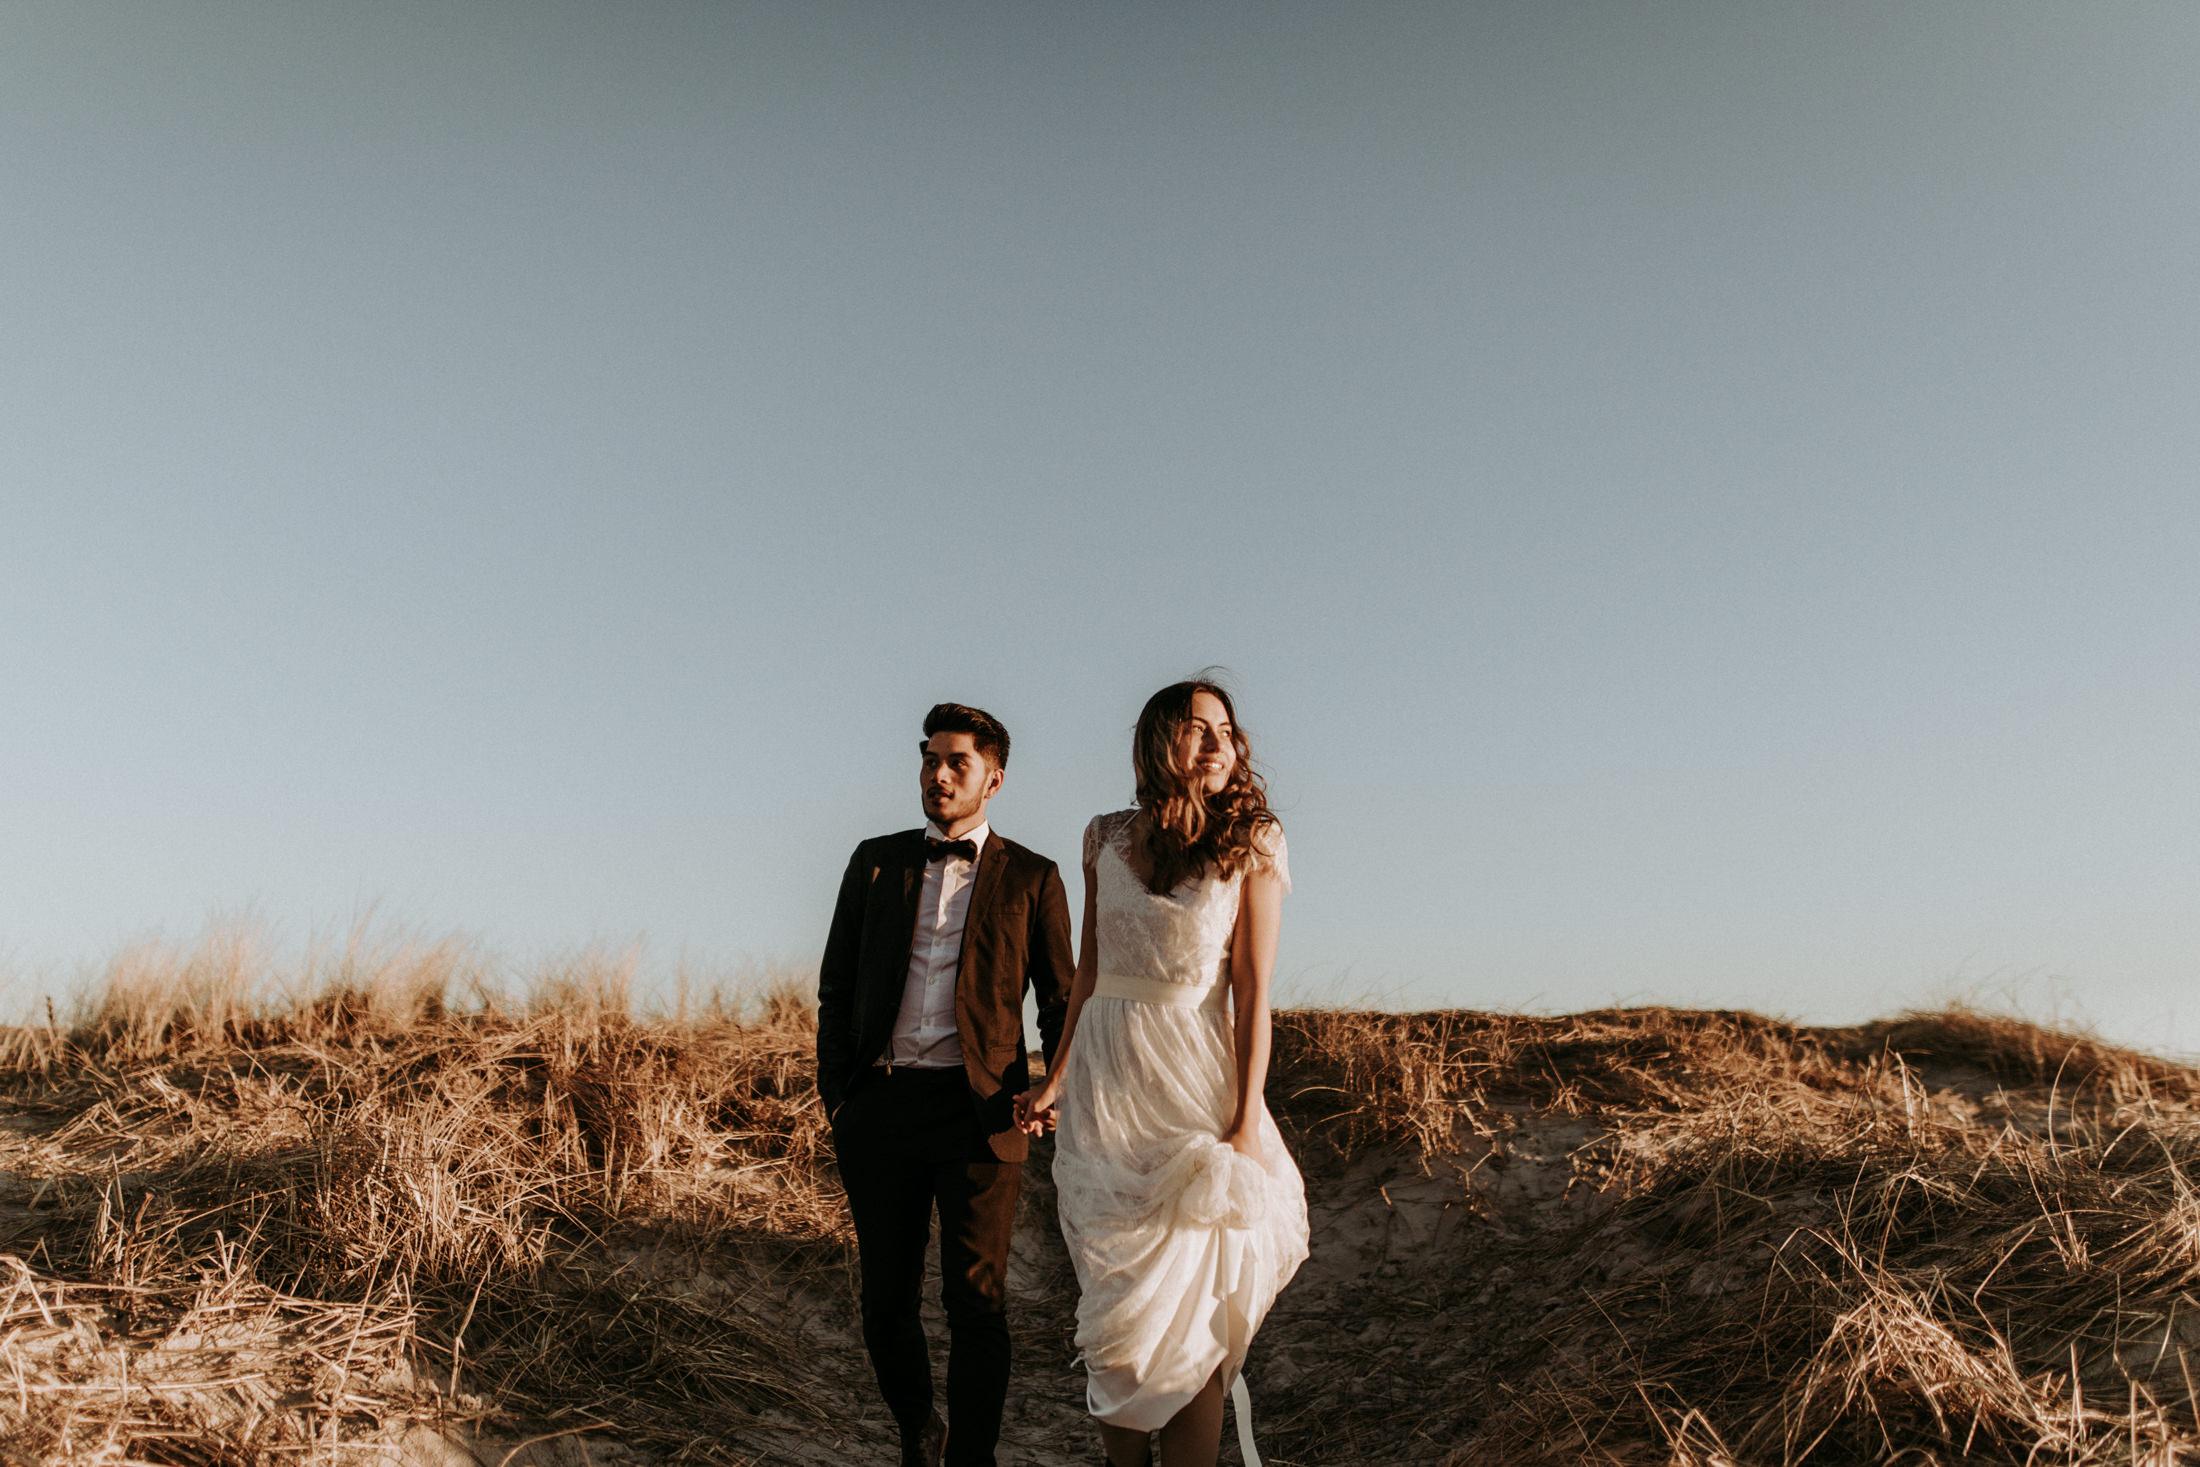 Wedding_Photographer_Mallorca_Daniela-Marquardt_Photography_CanaryIslands_Lanzarote_Iceland_Tuskany_Santorini_Portugal_Schweiz_Austria_Bayern_Elopement_Hochzeitsfotograf_Norddeichich_54